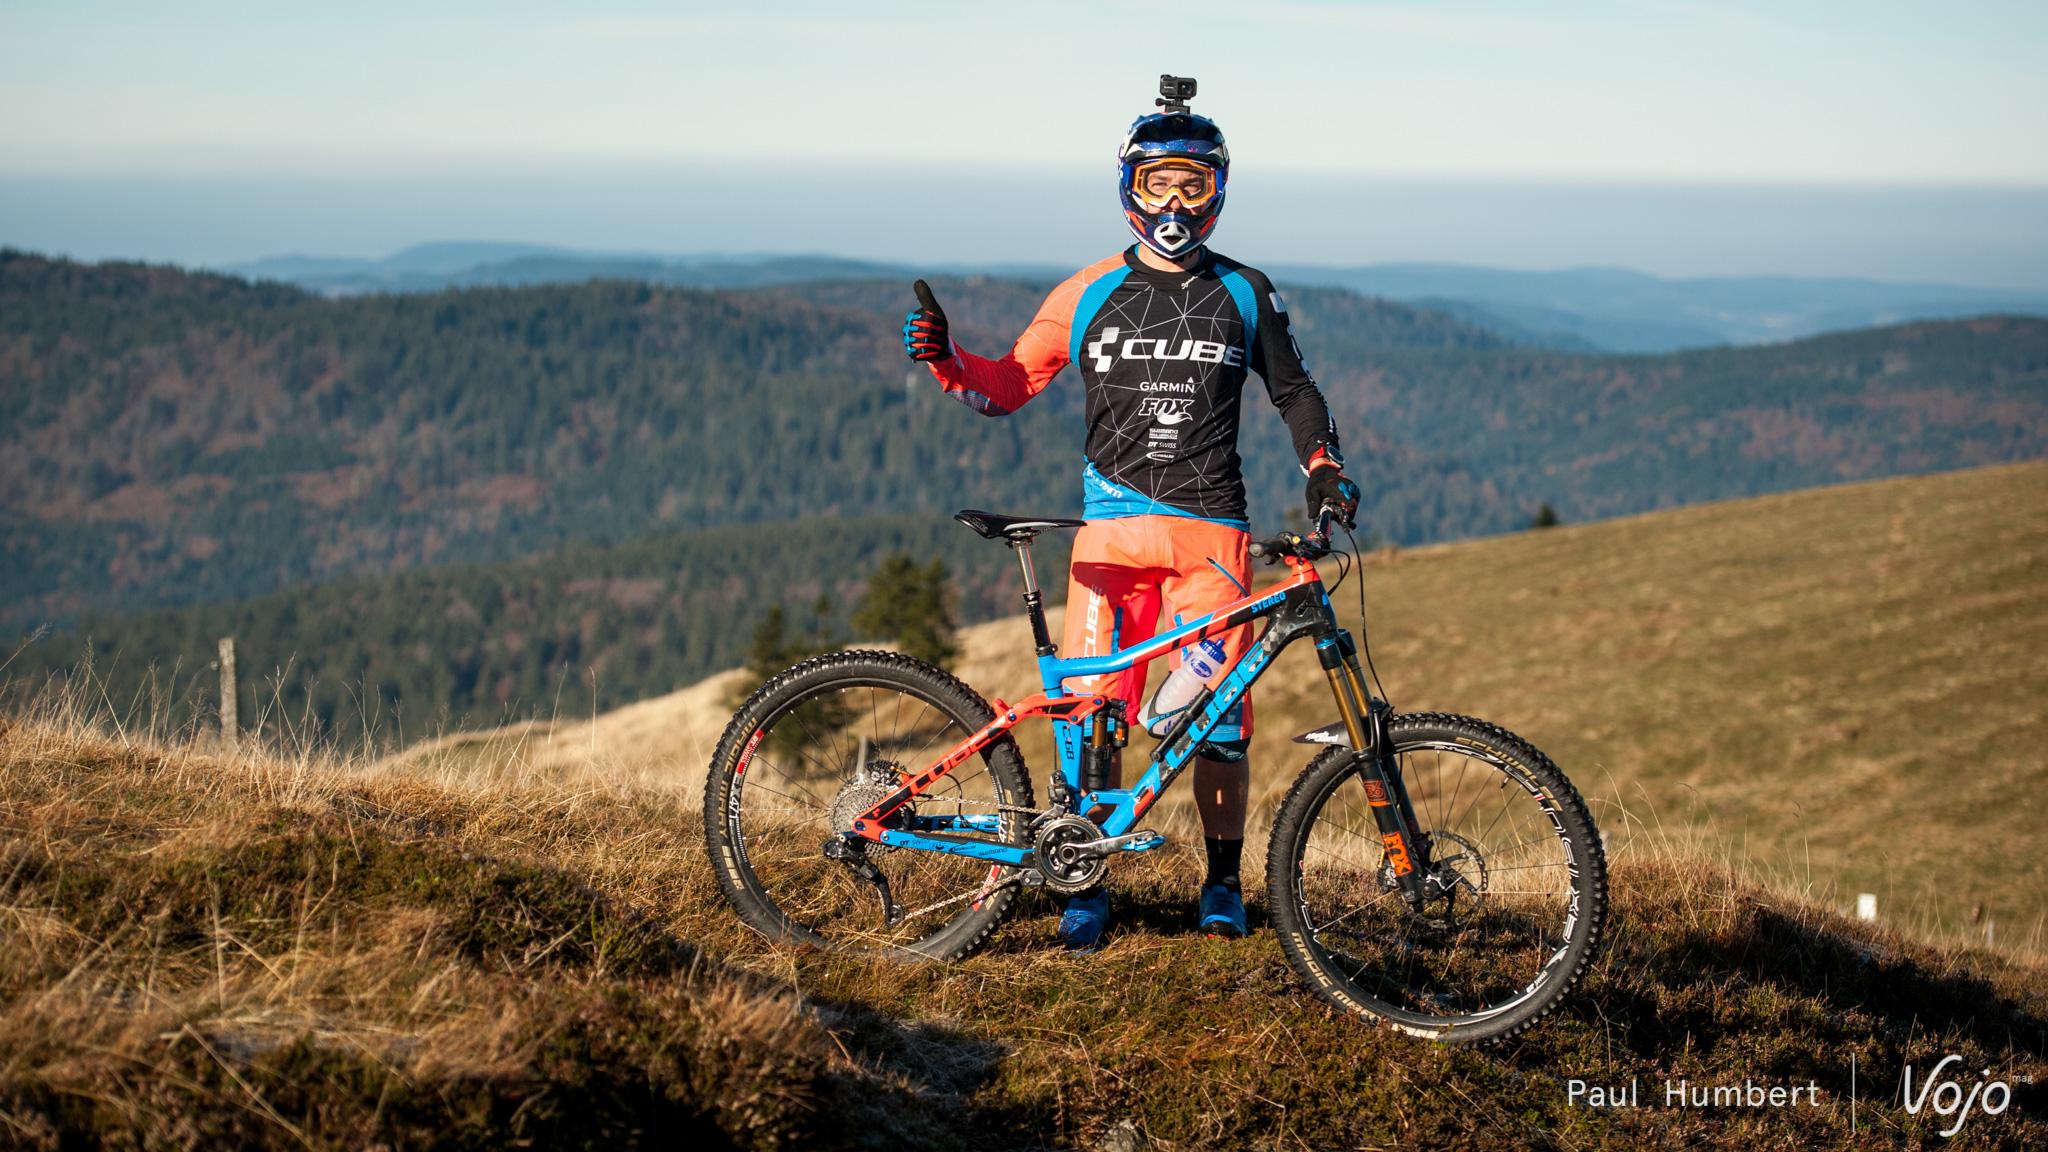 bike-check-nicolas-lau-Vojo-2015-Paul-Humbert-23